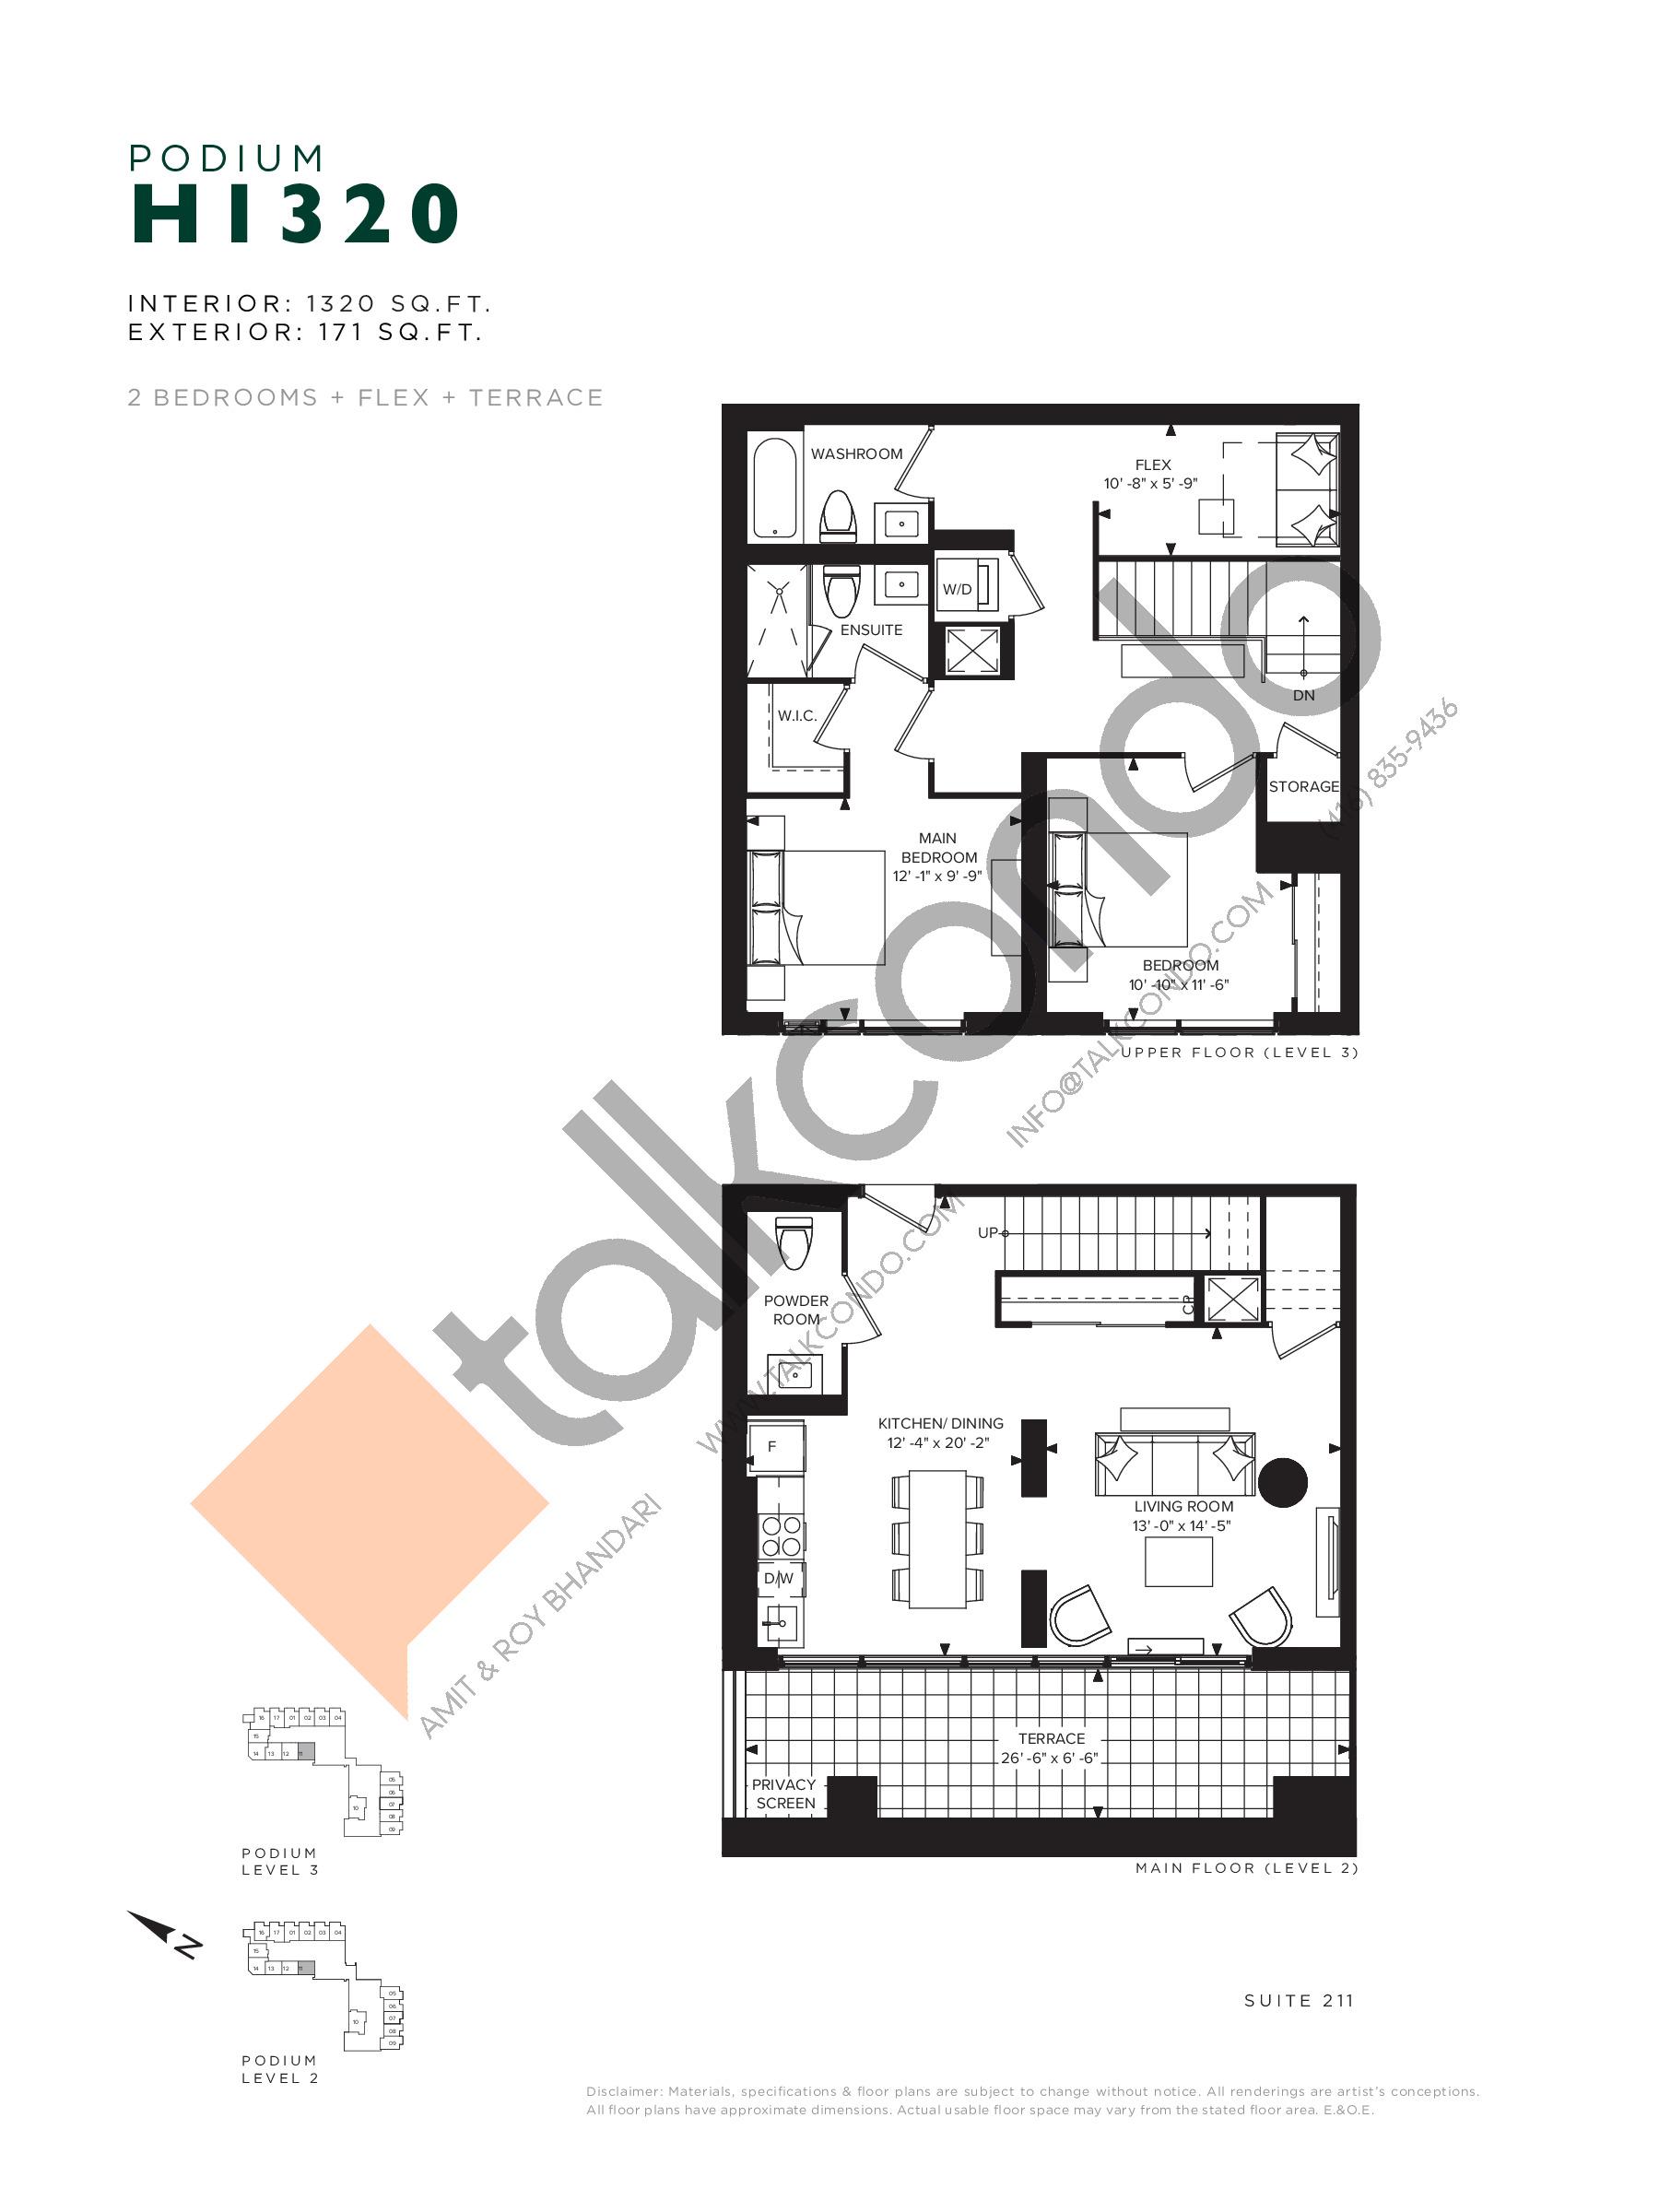 H1320 (Podium) Floor Plan at Hillmont at SXSW Condos - 1320 sq.ft